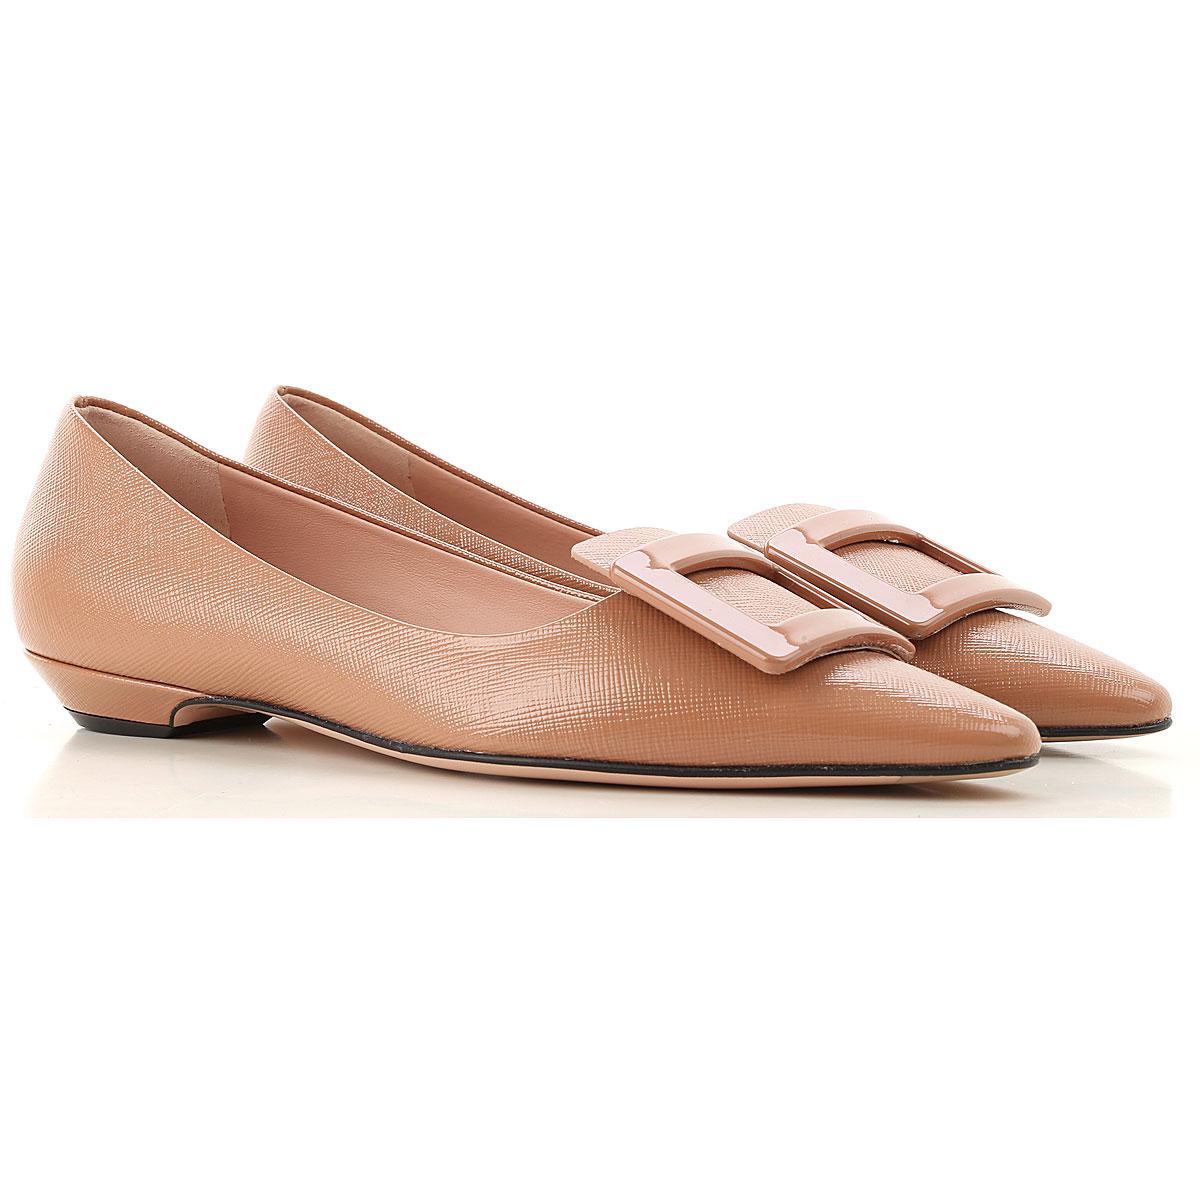 Roberto Festa Ballet Flats Ballerina Shoes for Women On Sale, dark Powder Rose, Leather, 2019, 6 7